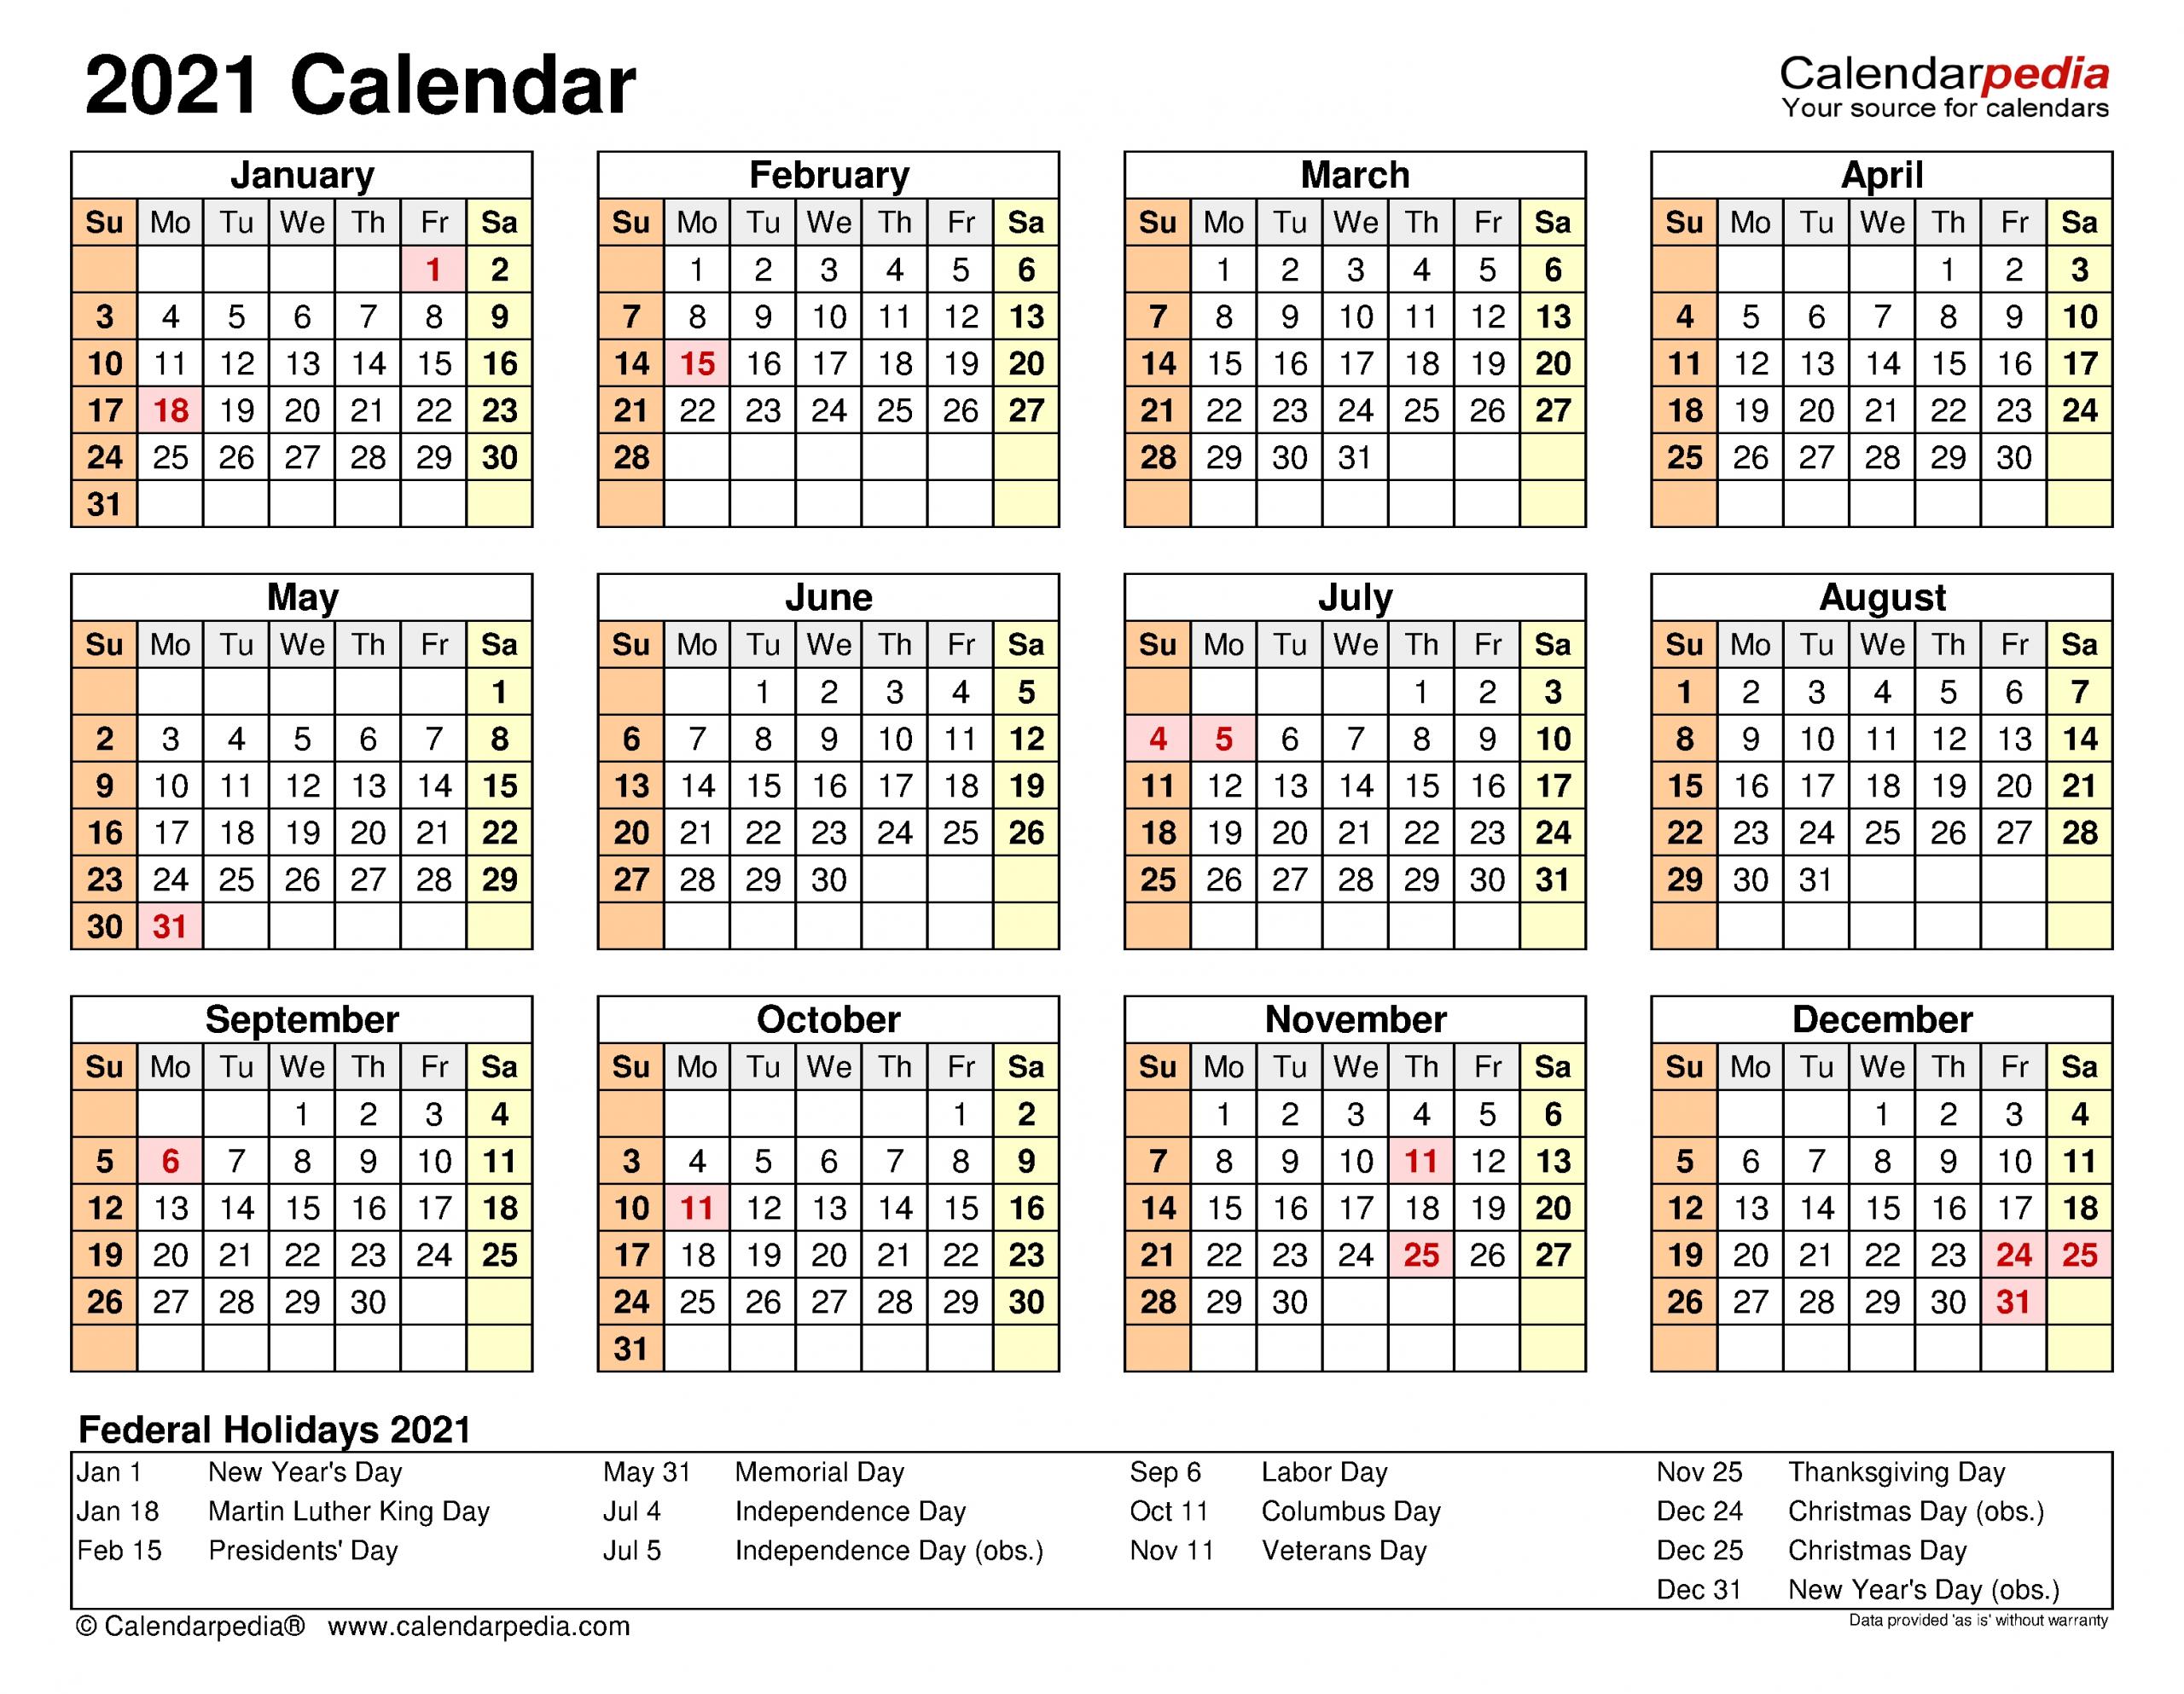 2021 Calendar - Free Printable Excel Templates - Calendarpedia-Microsoft 2021 Calendar Templates Free